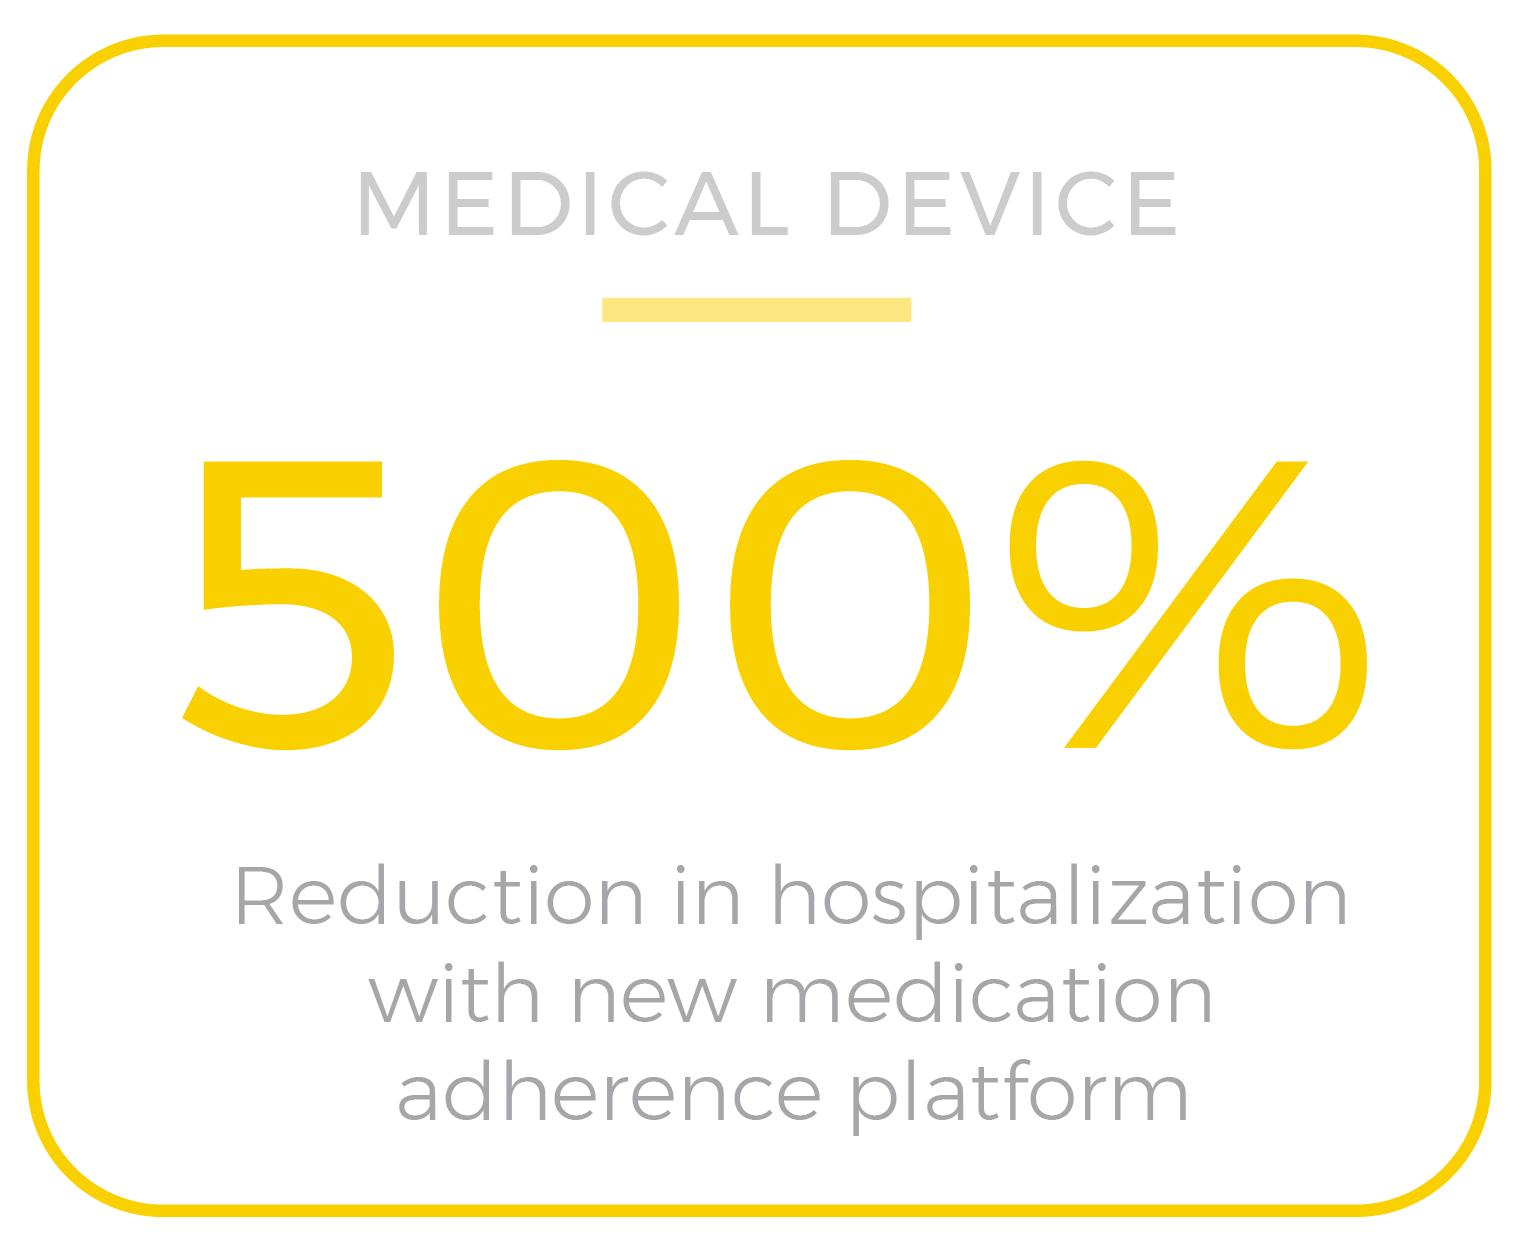 MedicalDevice-06.jpg